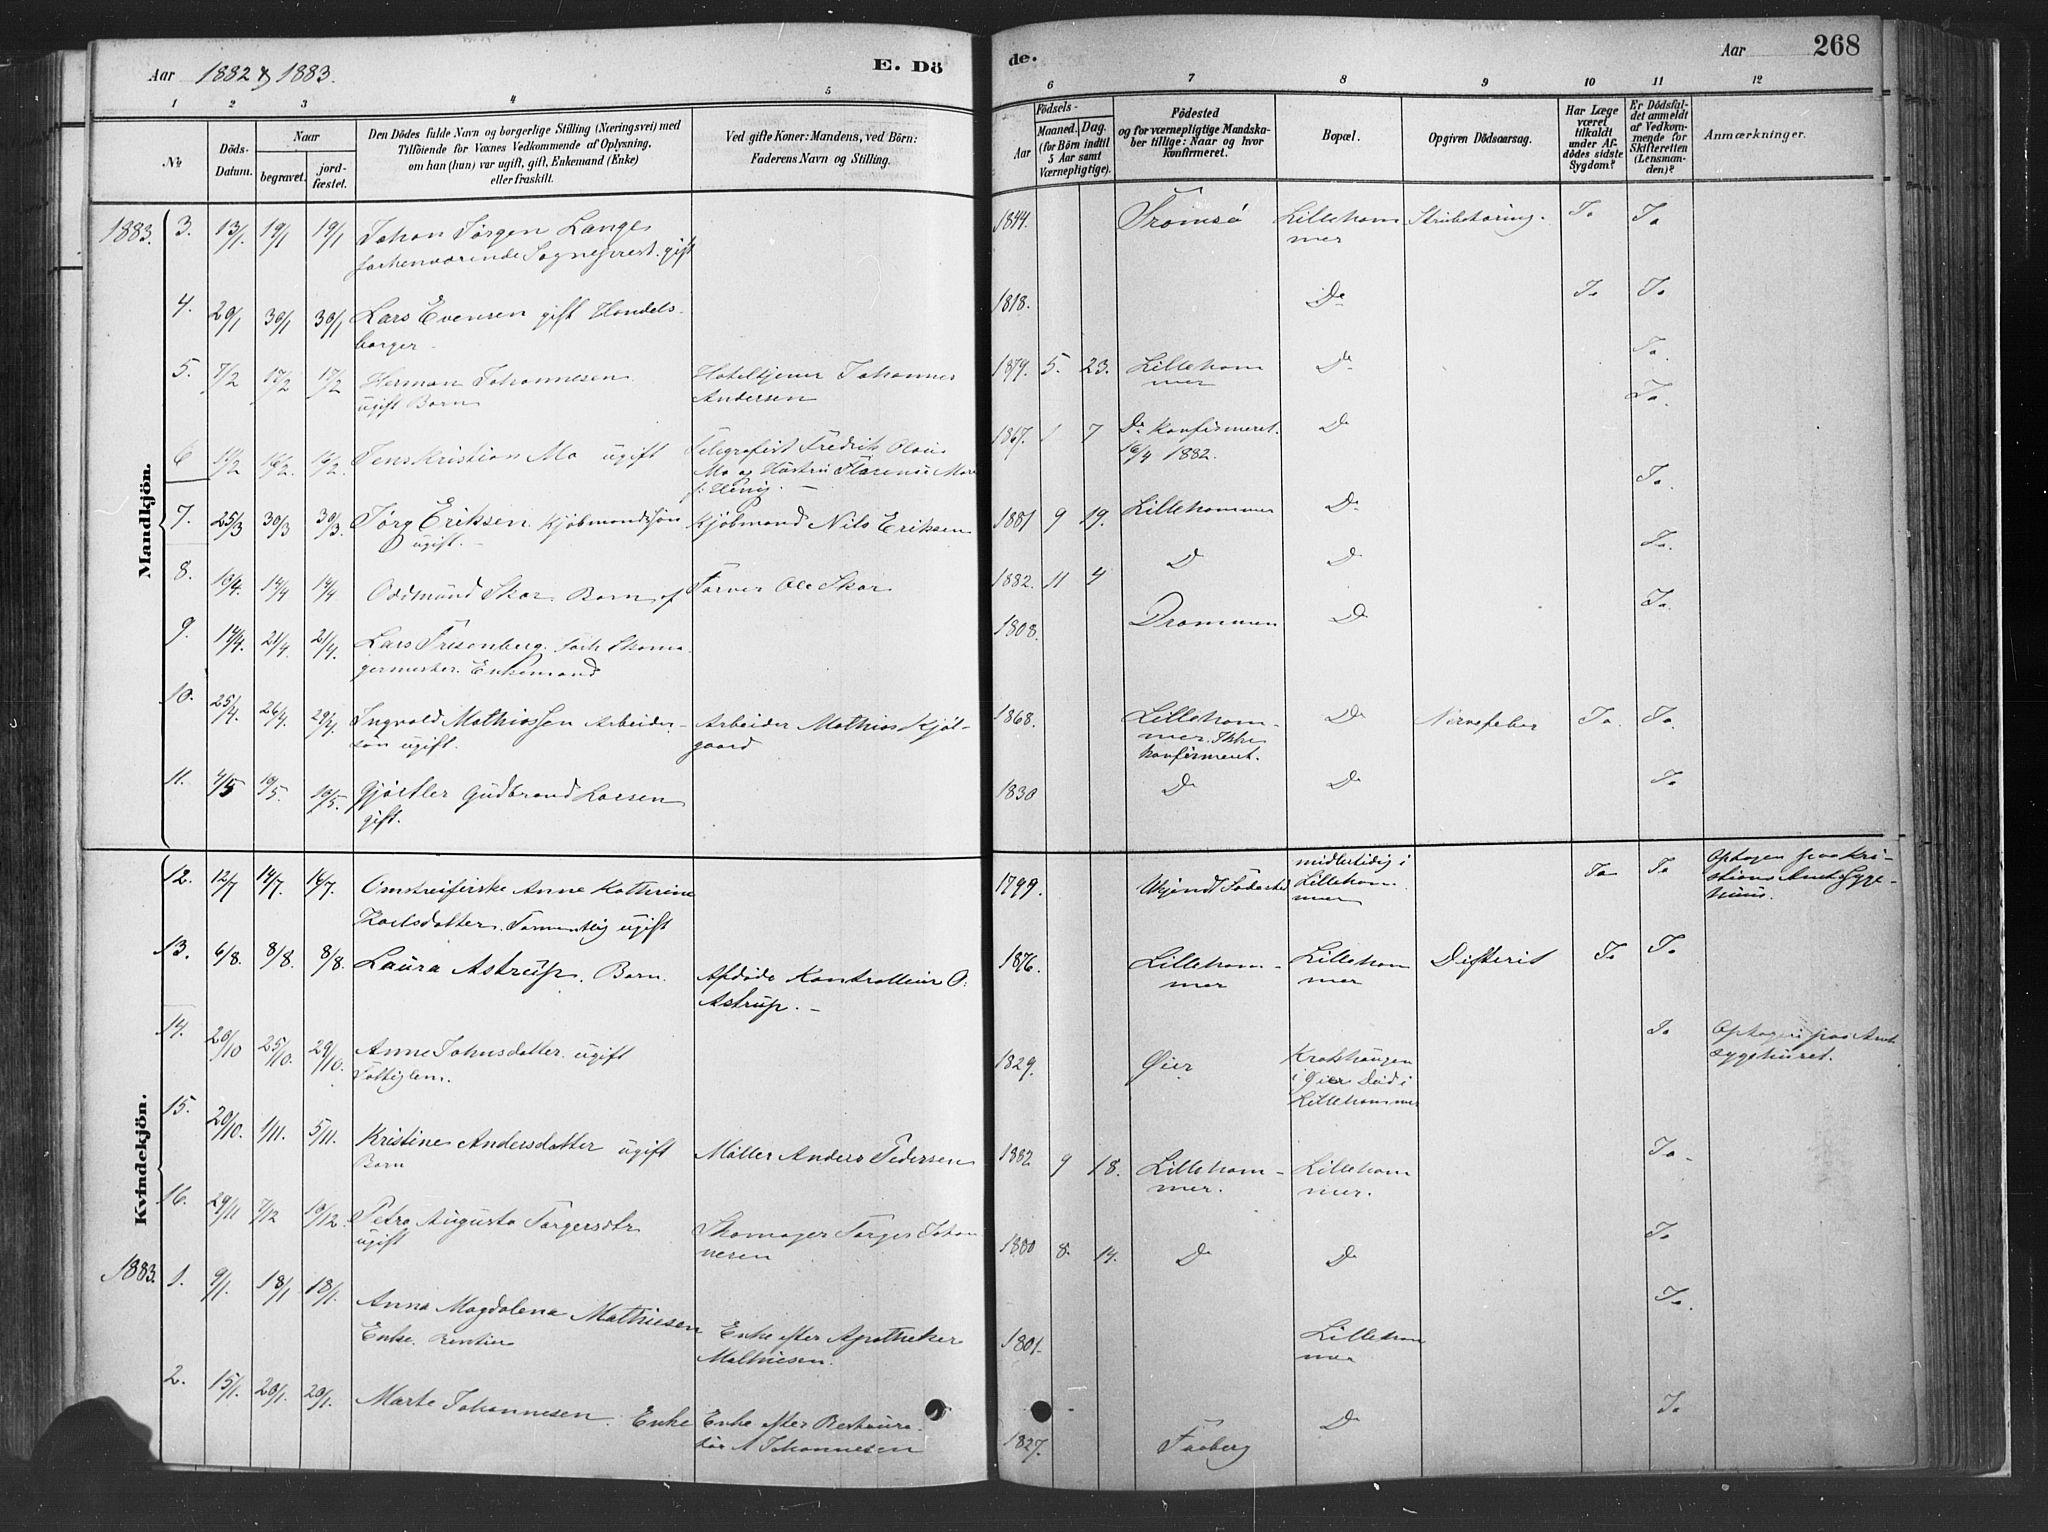 SAH, Fåberg prestekontor, H/Ha/Haa/L0010: Parish register (official) no. 10, 1879-1900, p. 268